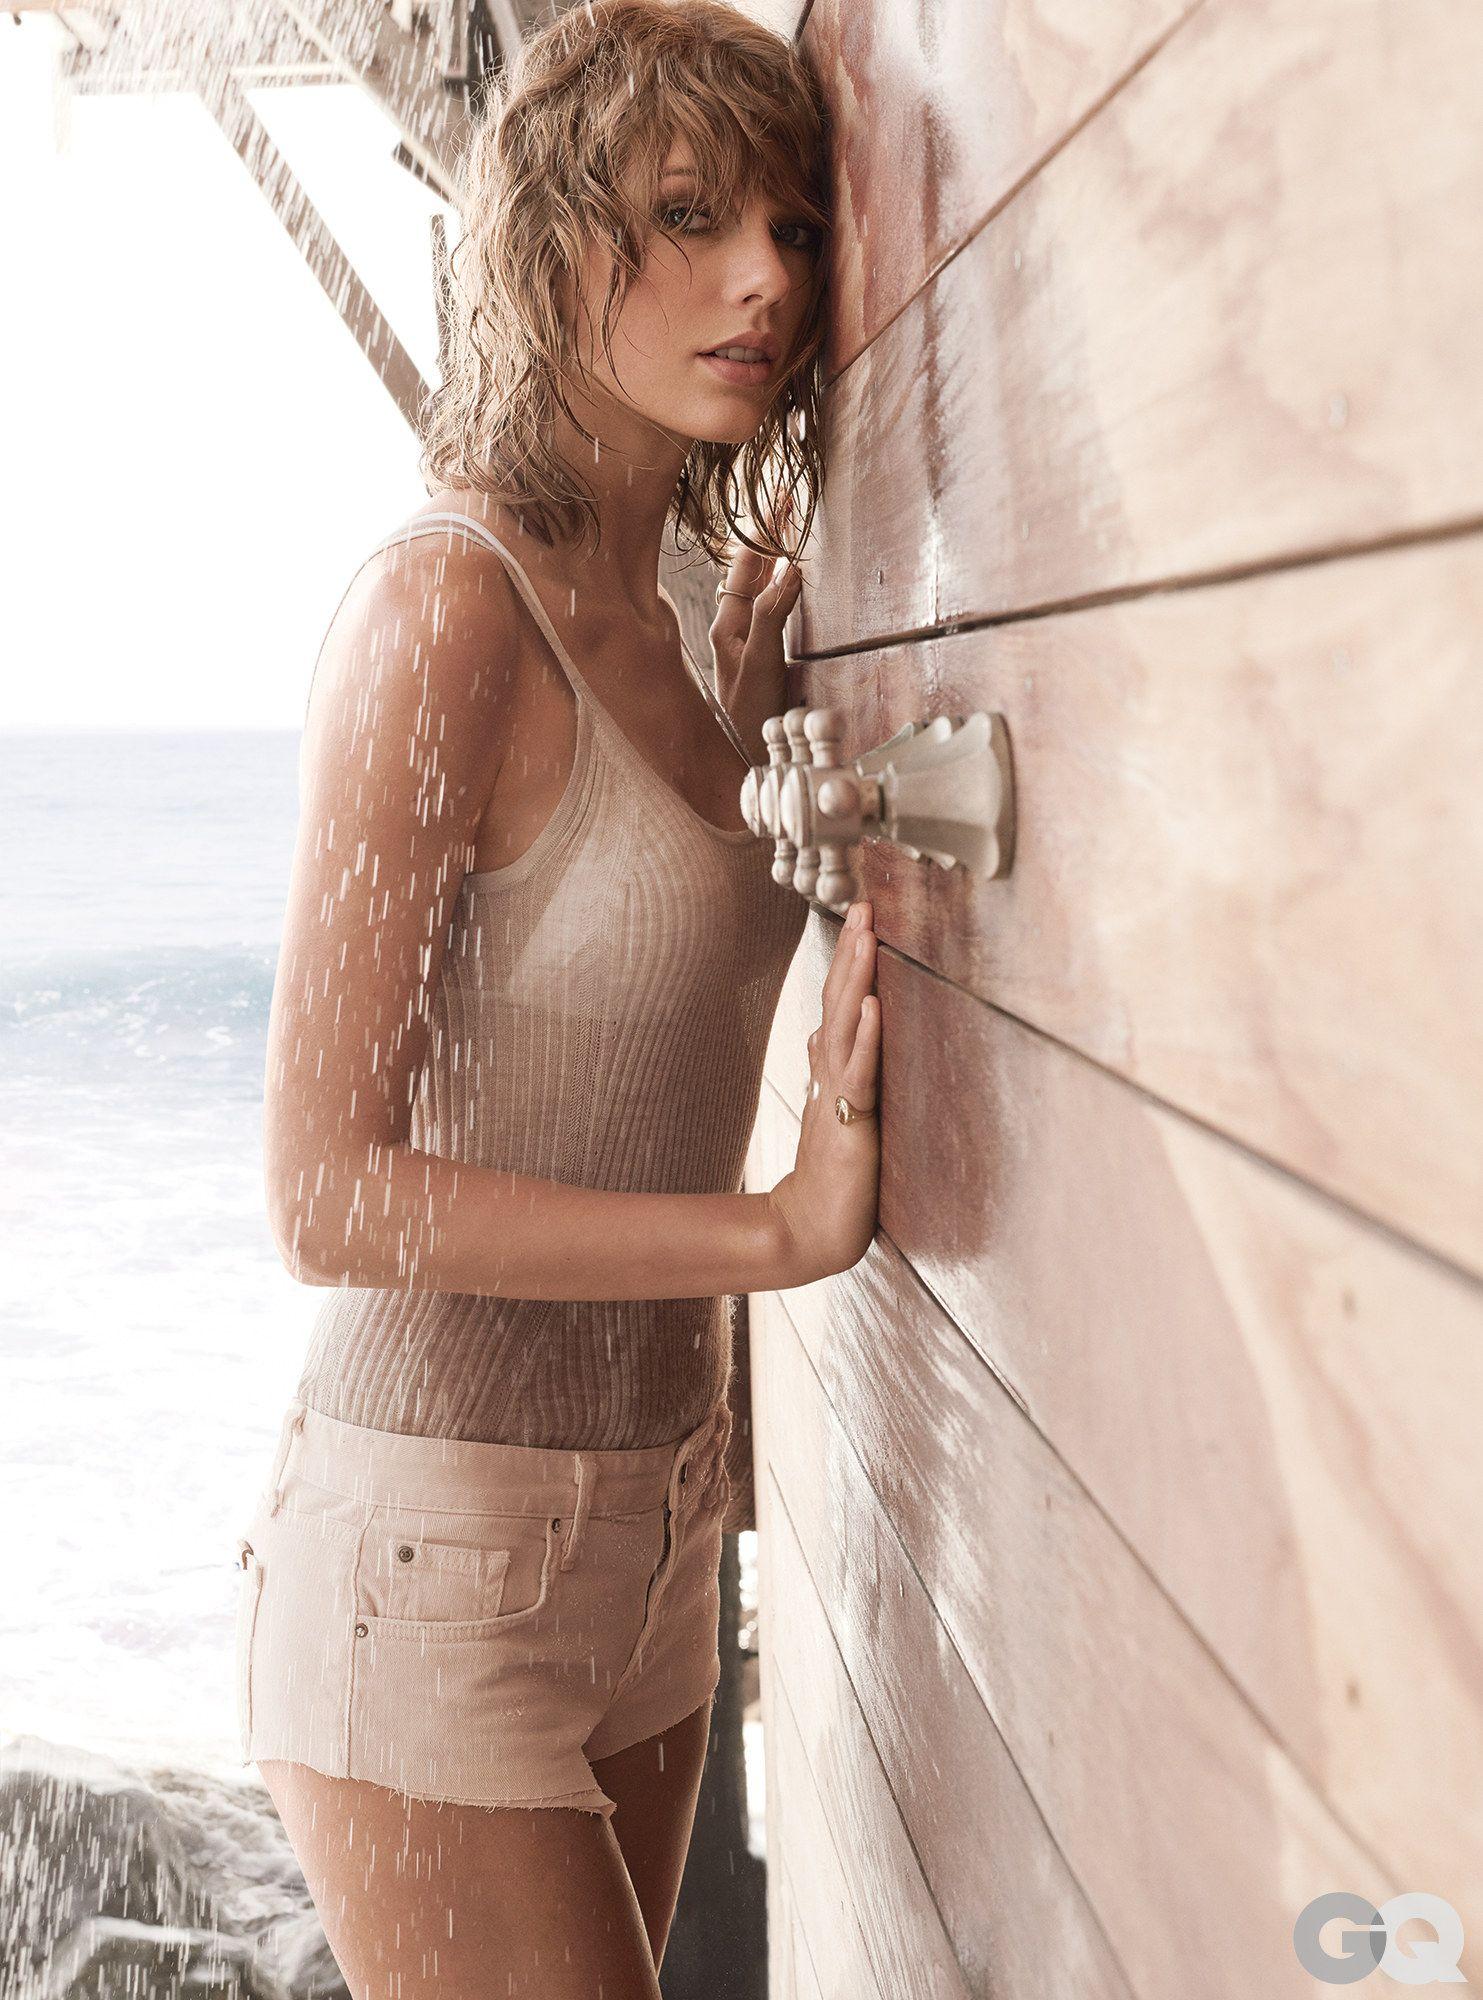 Fotos Ashley Blankenship naked (36 photos), Topless, Bikini, Instagram, butt 2006